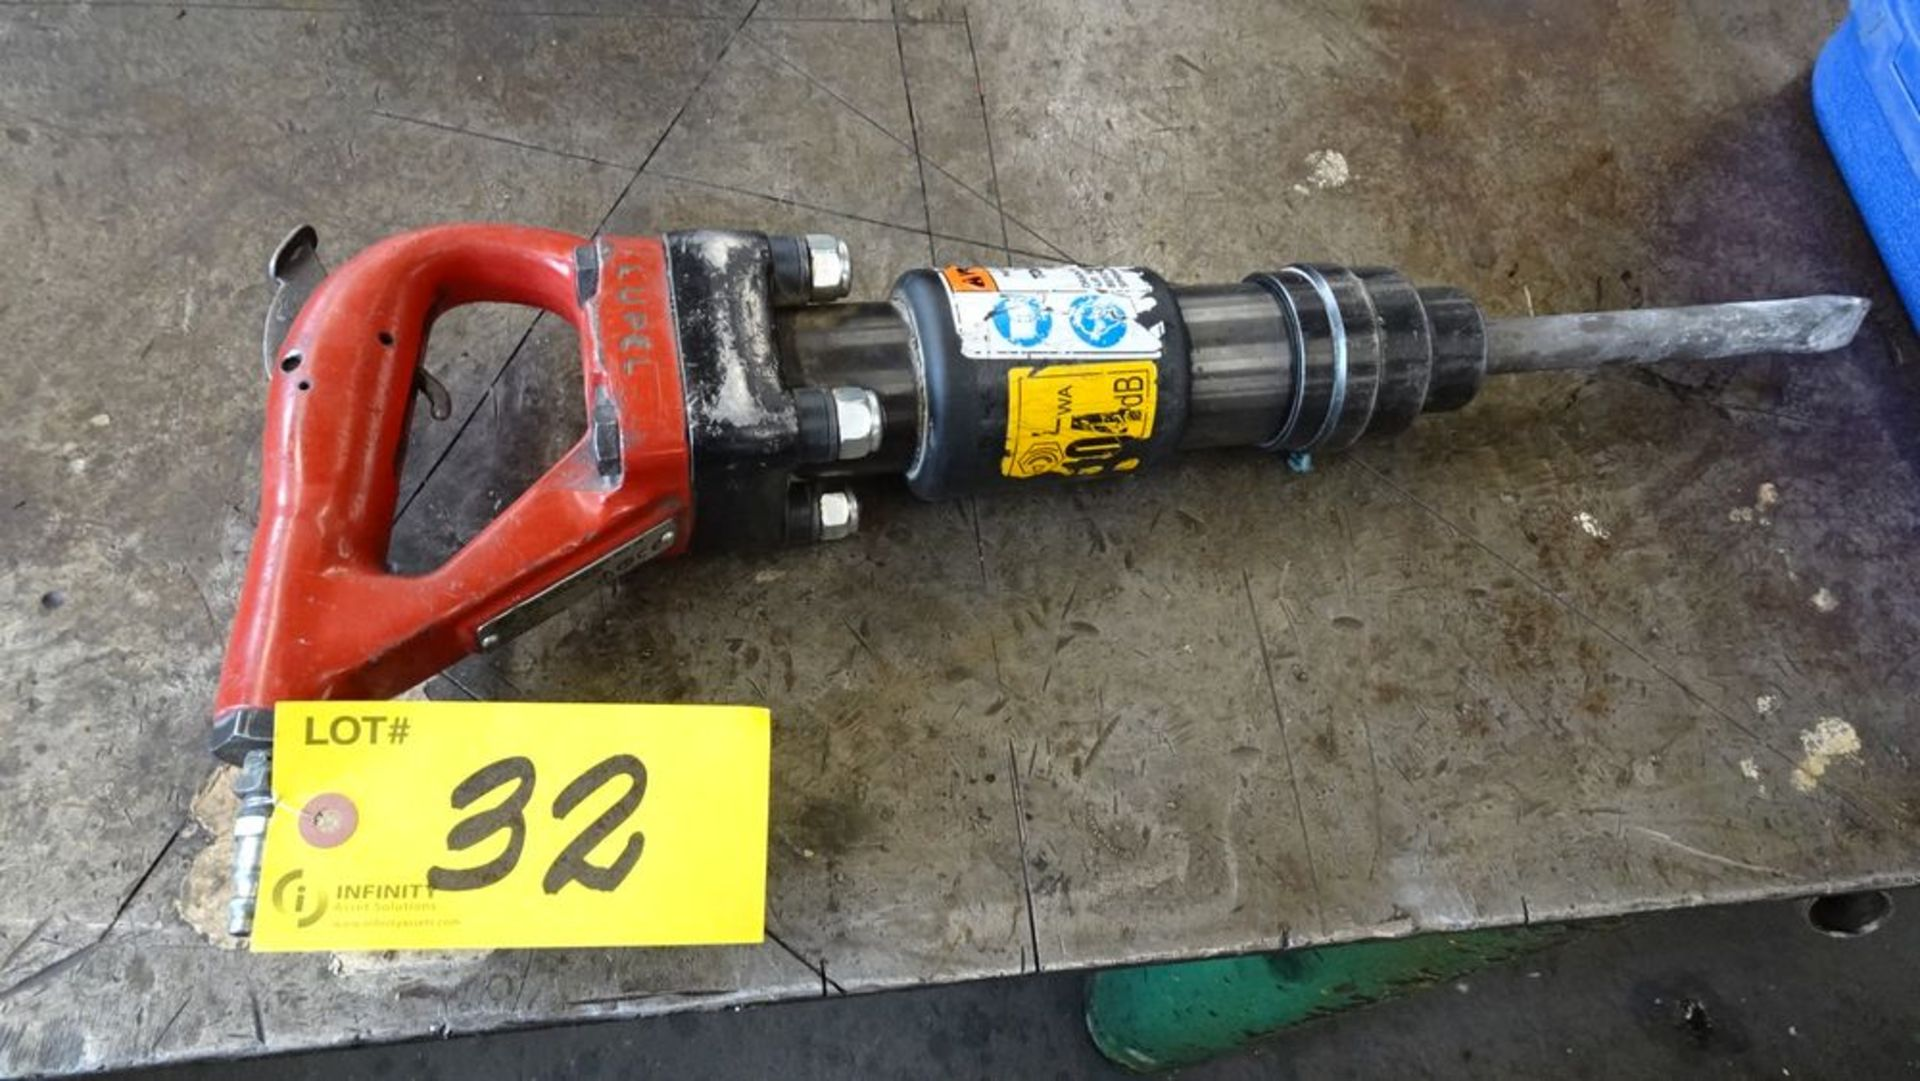 Lot 32 - 2012 ATLAS COPCO CP4130 PNEUMATIC JACK HAMMER, S/N 026805